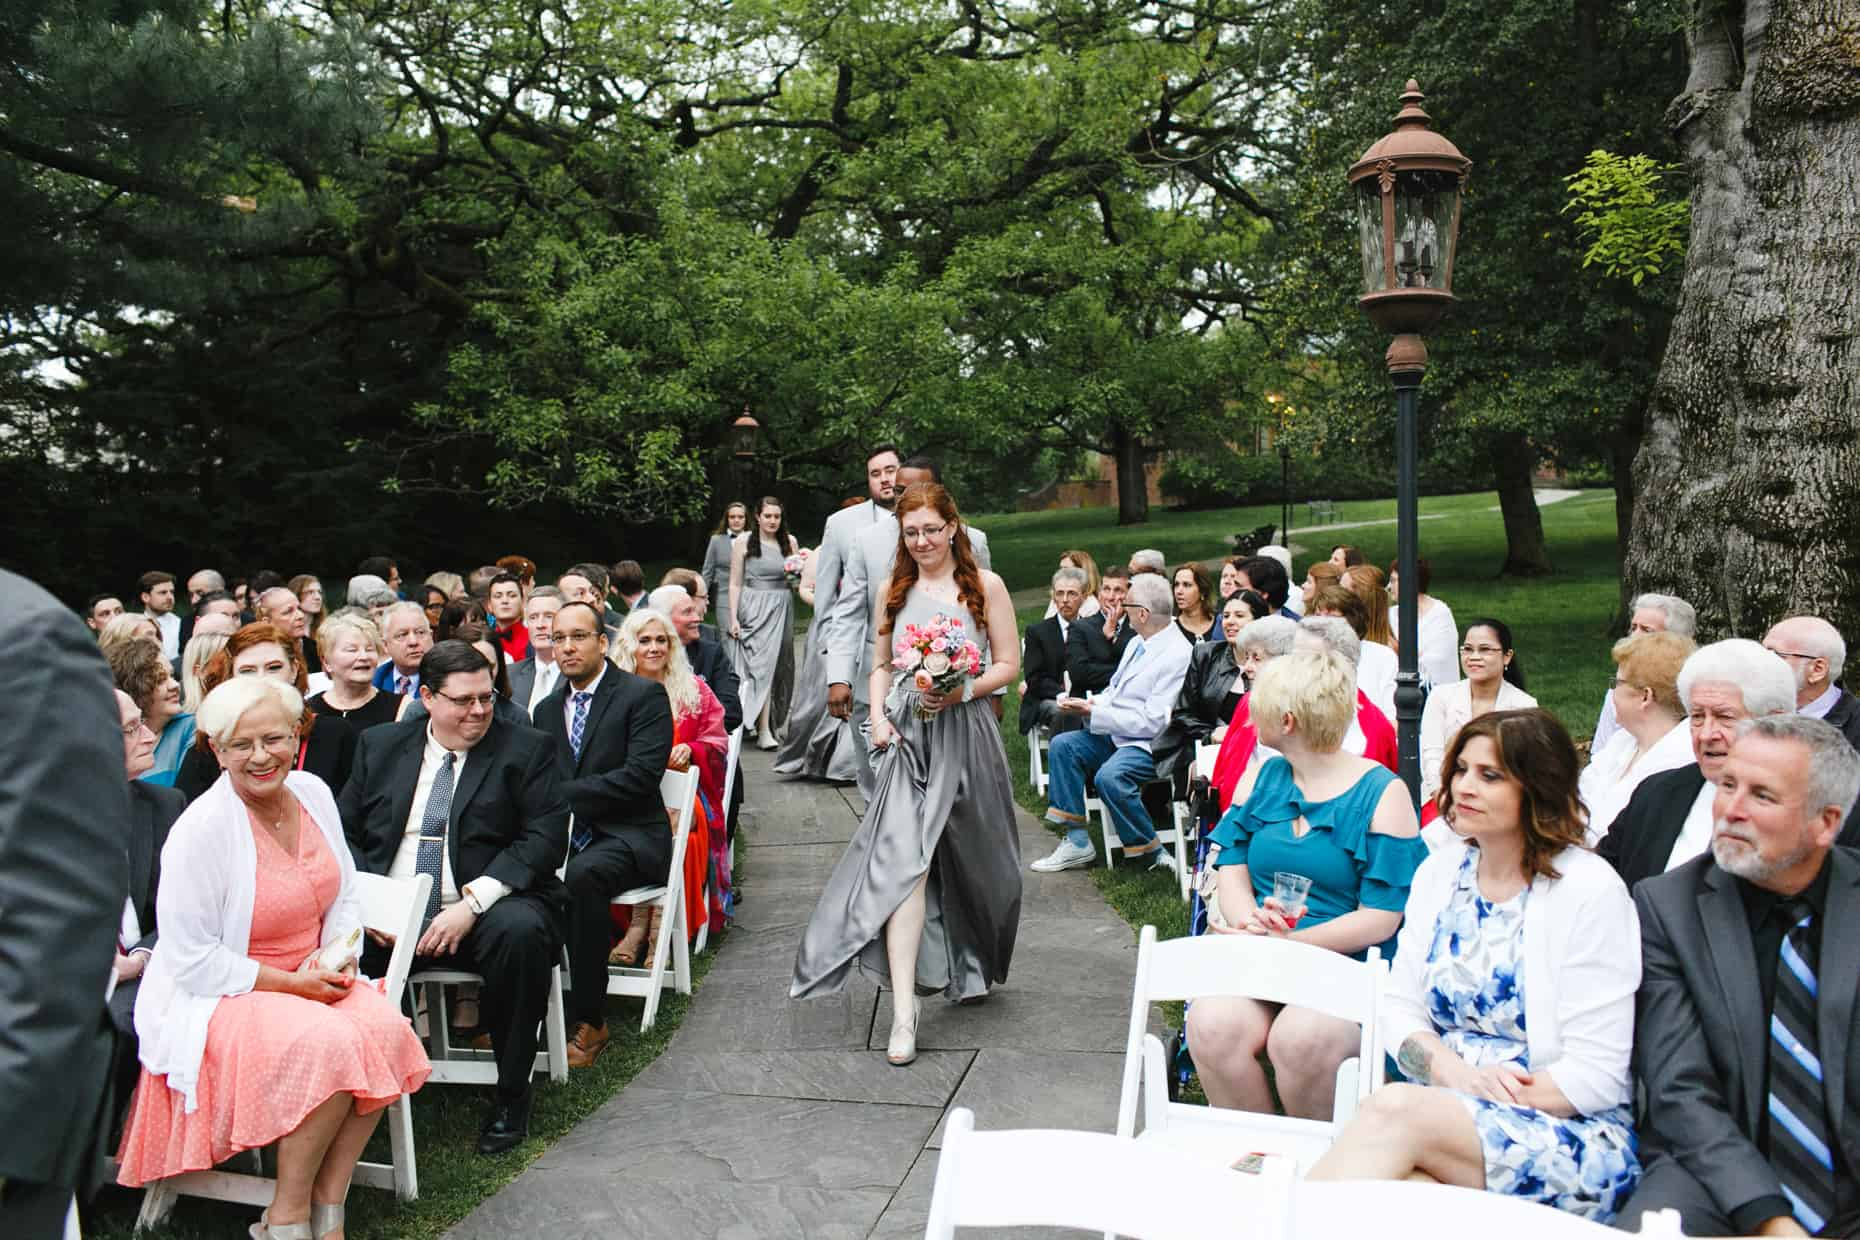 Wedding Pictures Bucks County